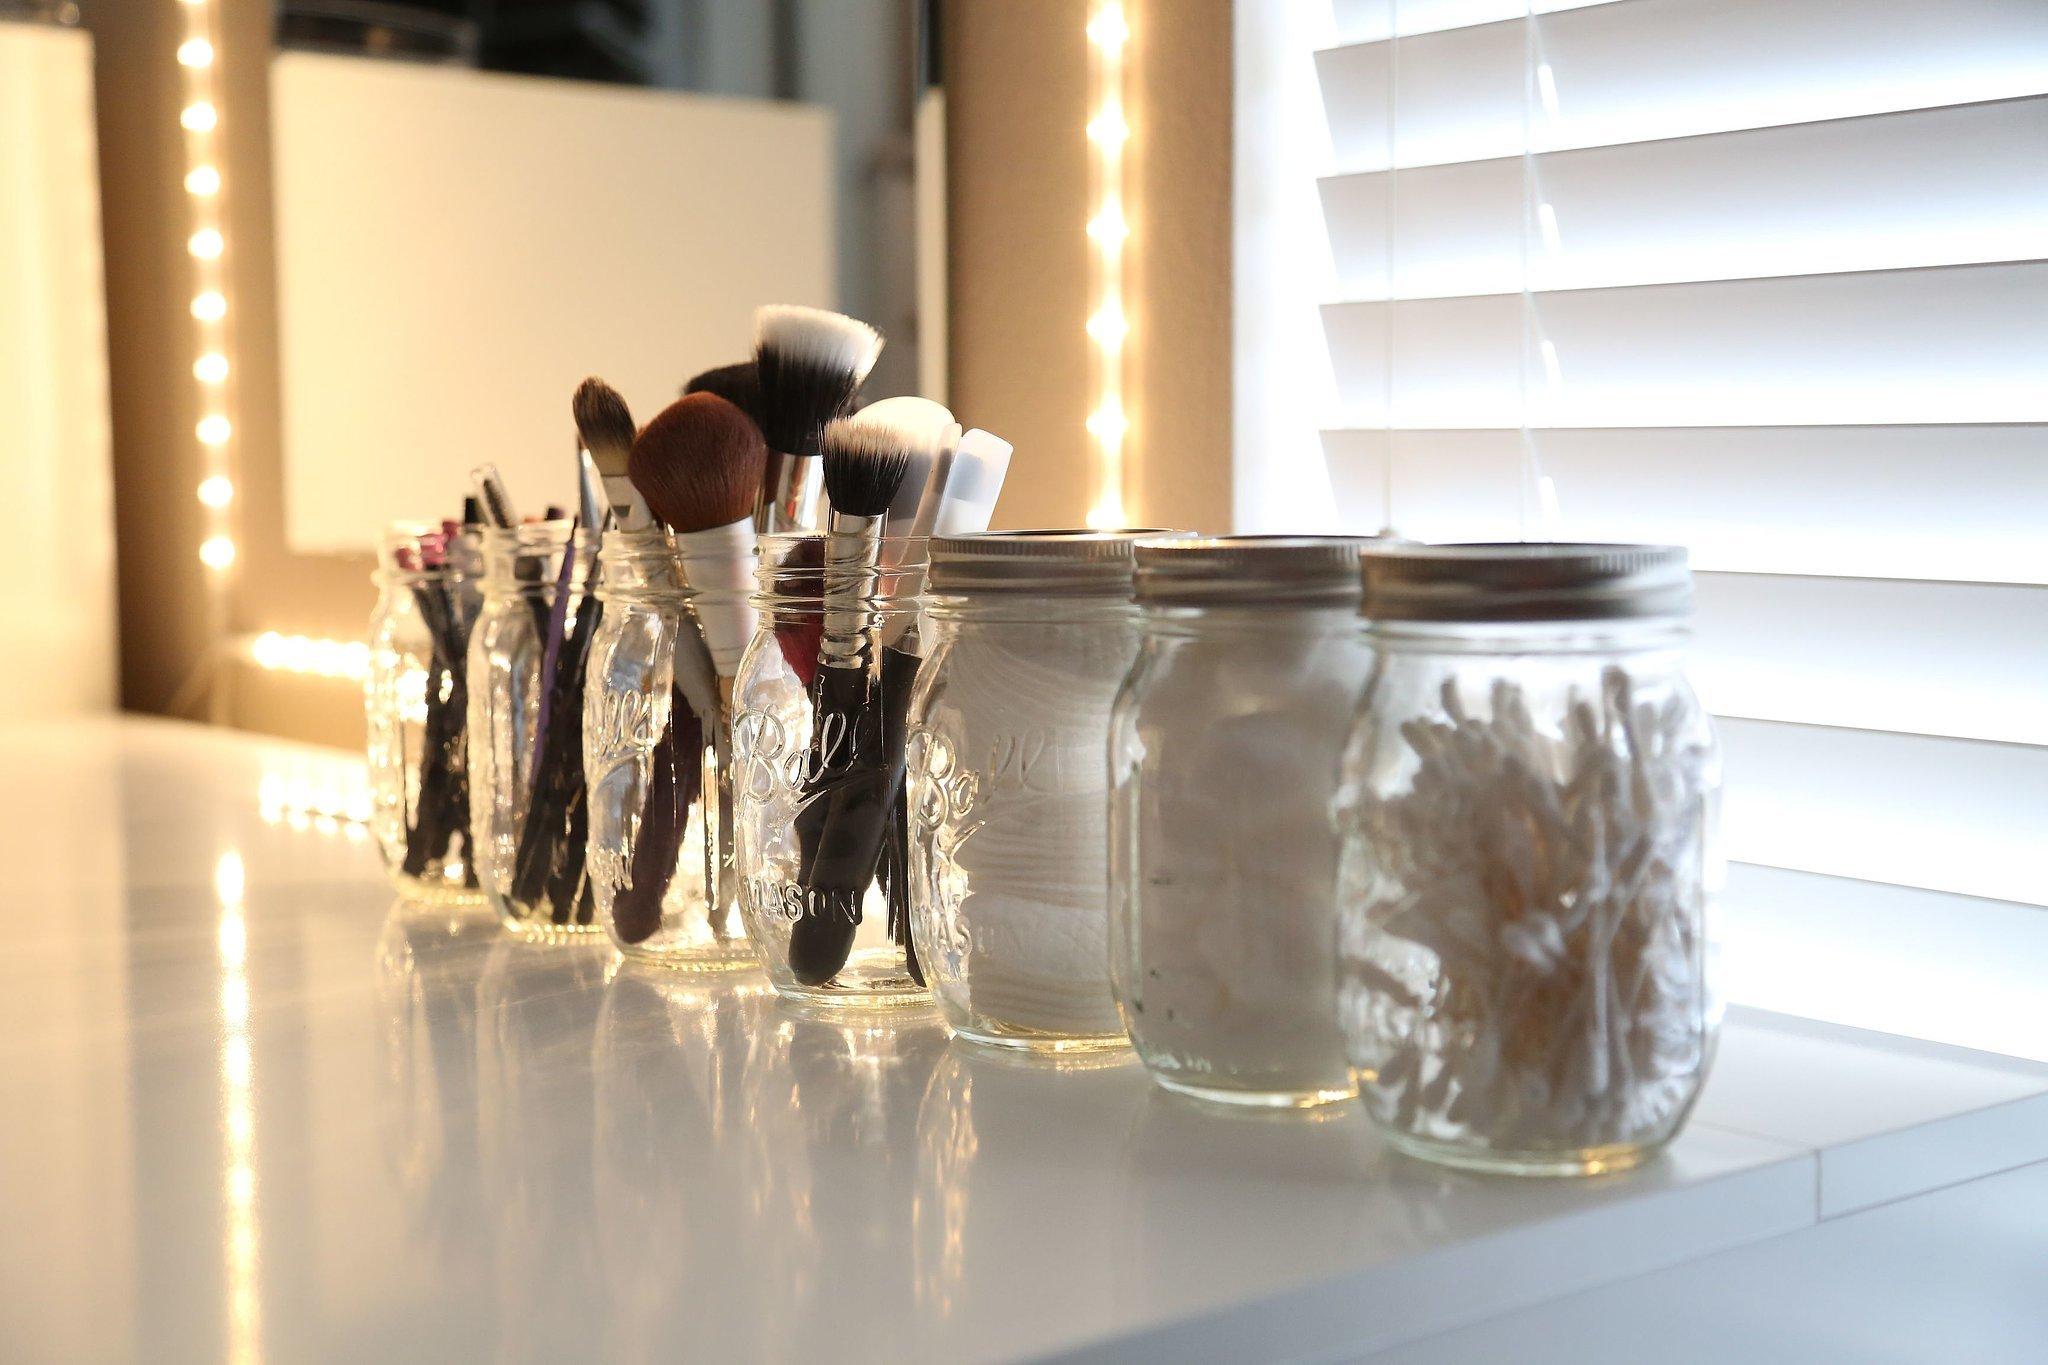 Mason jars for your brushes